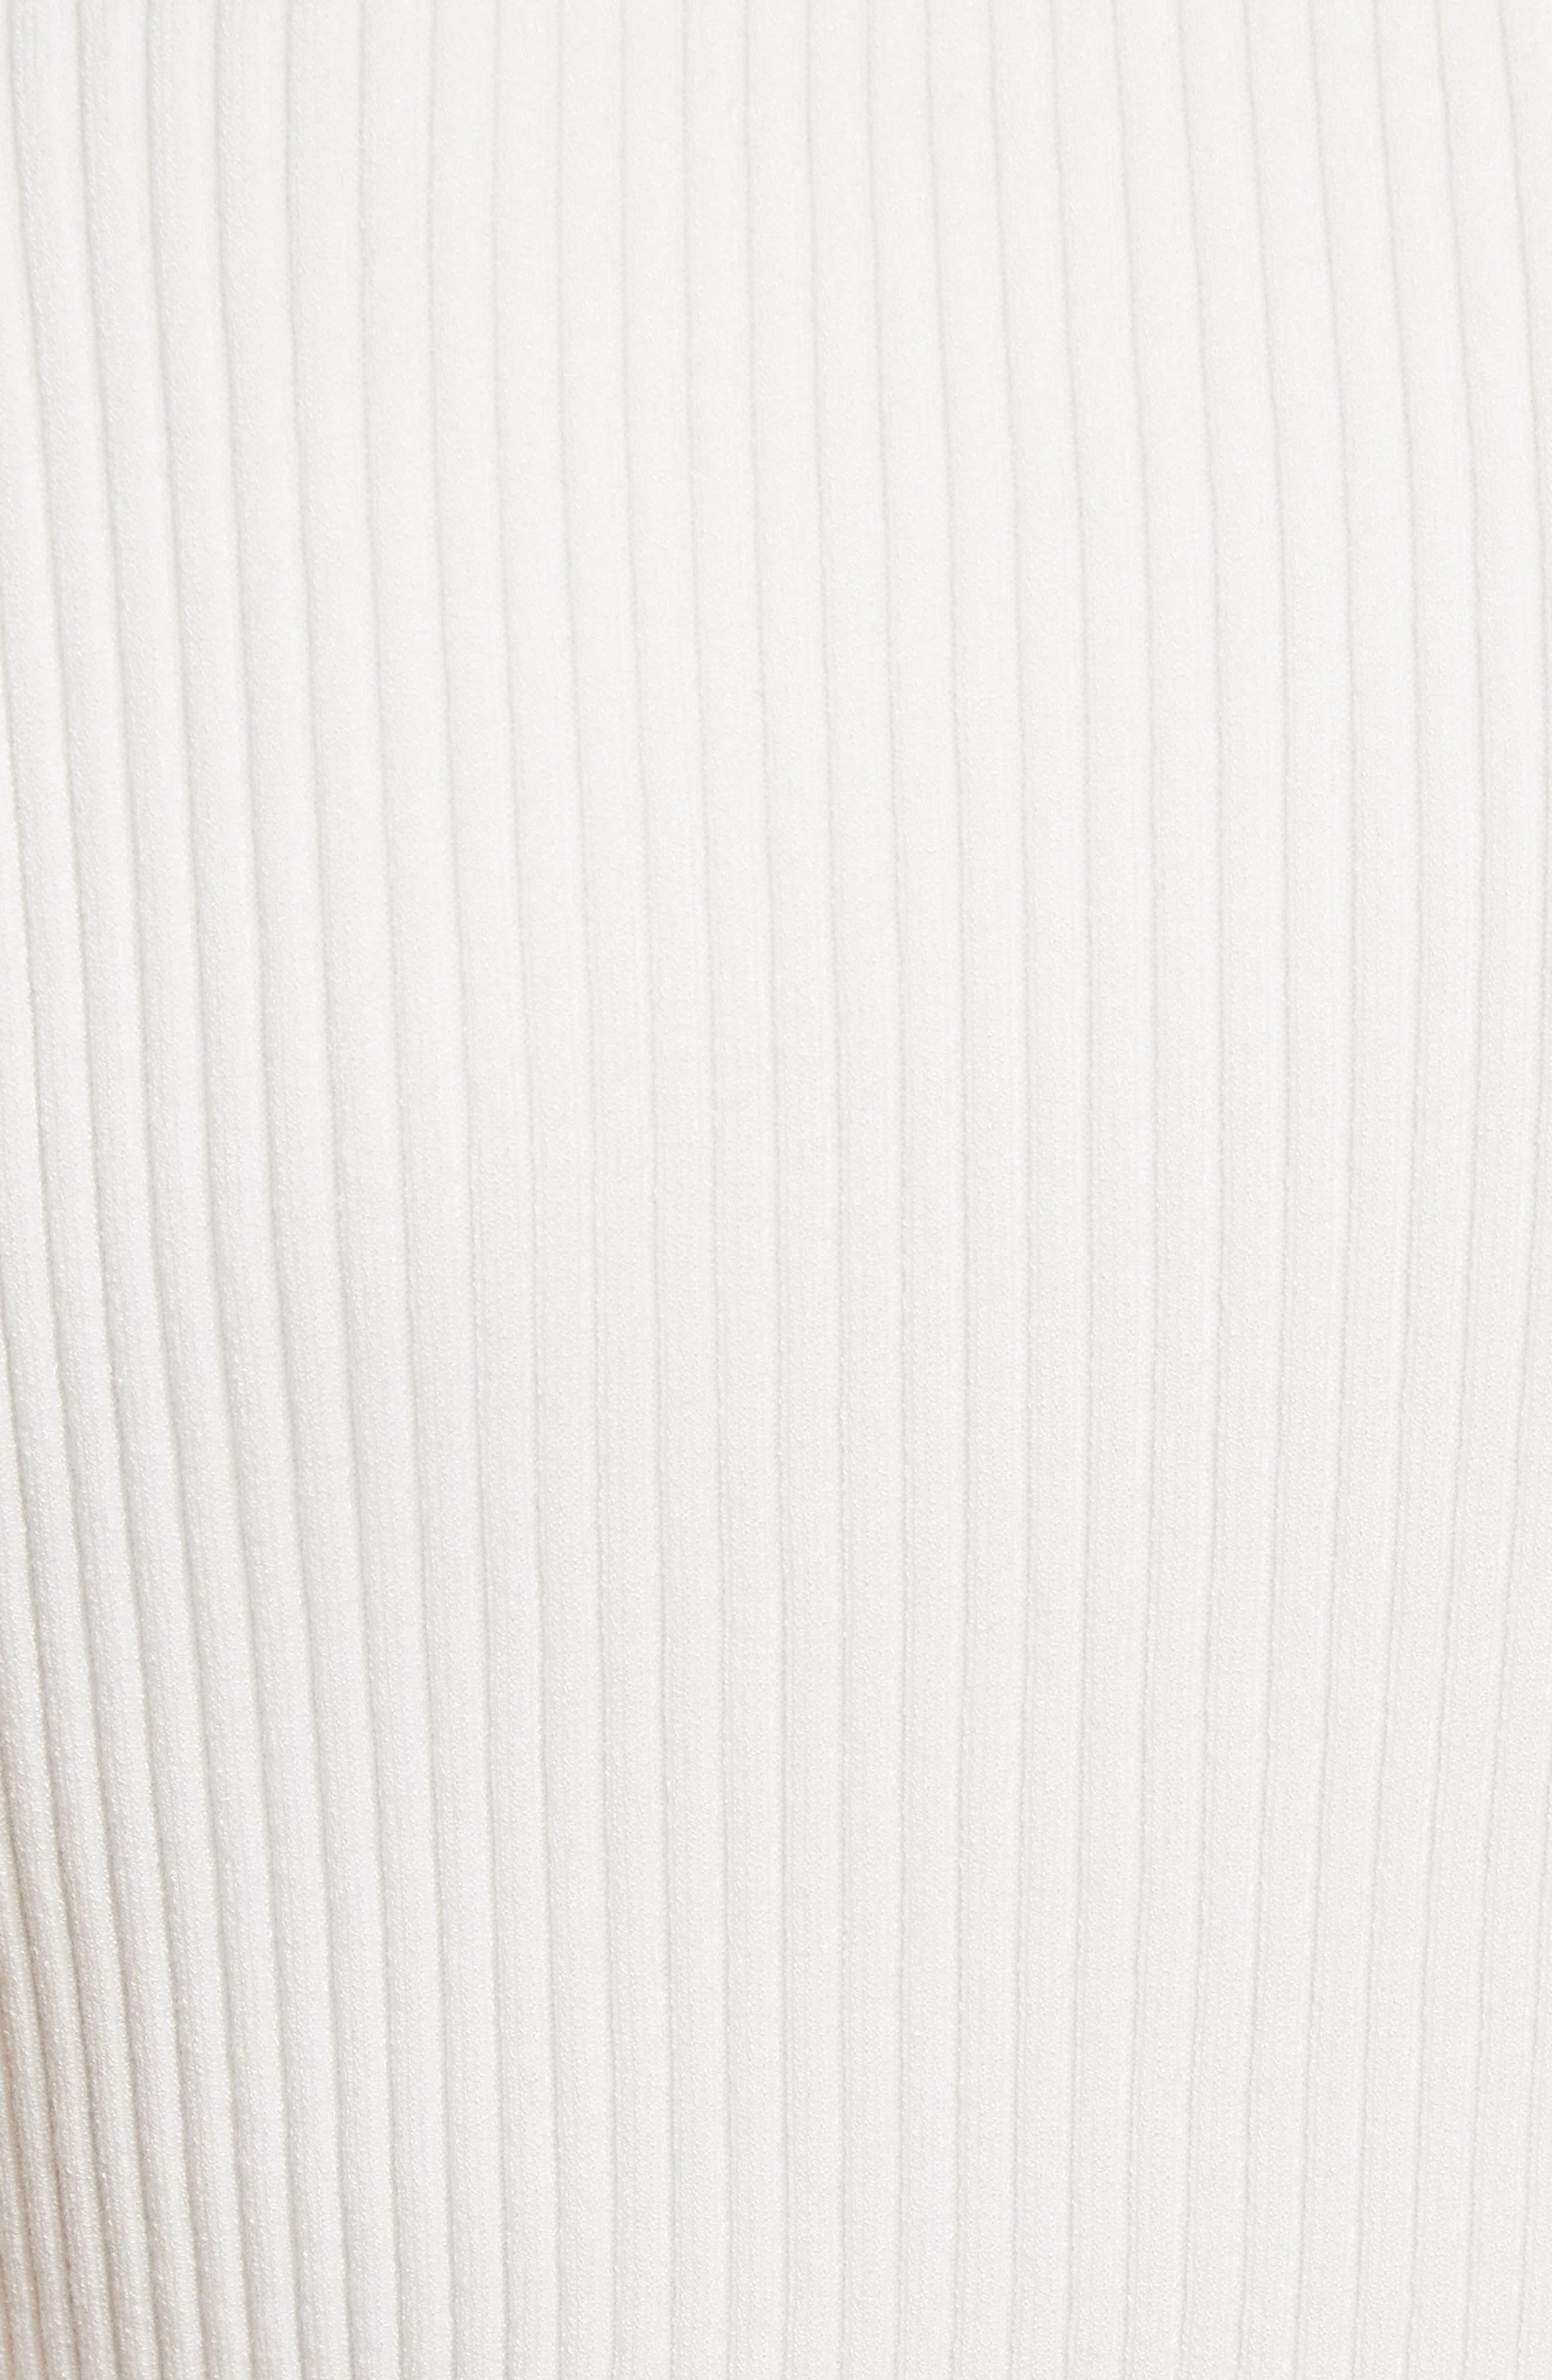 Ruffle Edge Ribbed Shell,                             Alternate thumbnail 5, color,                             White